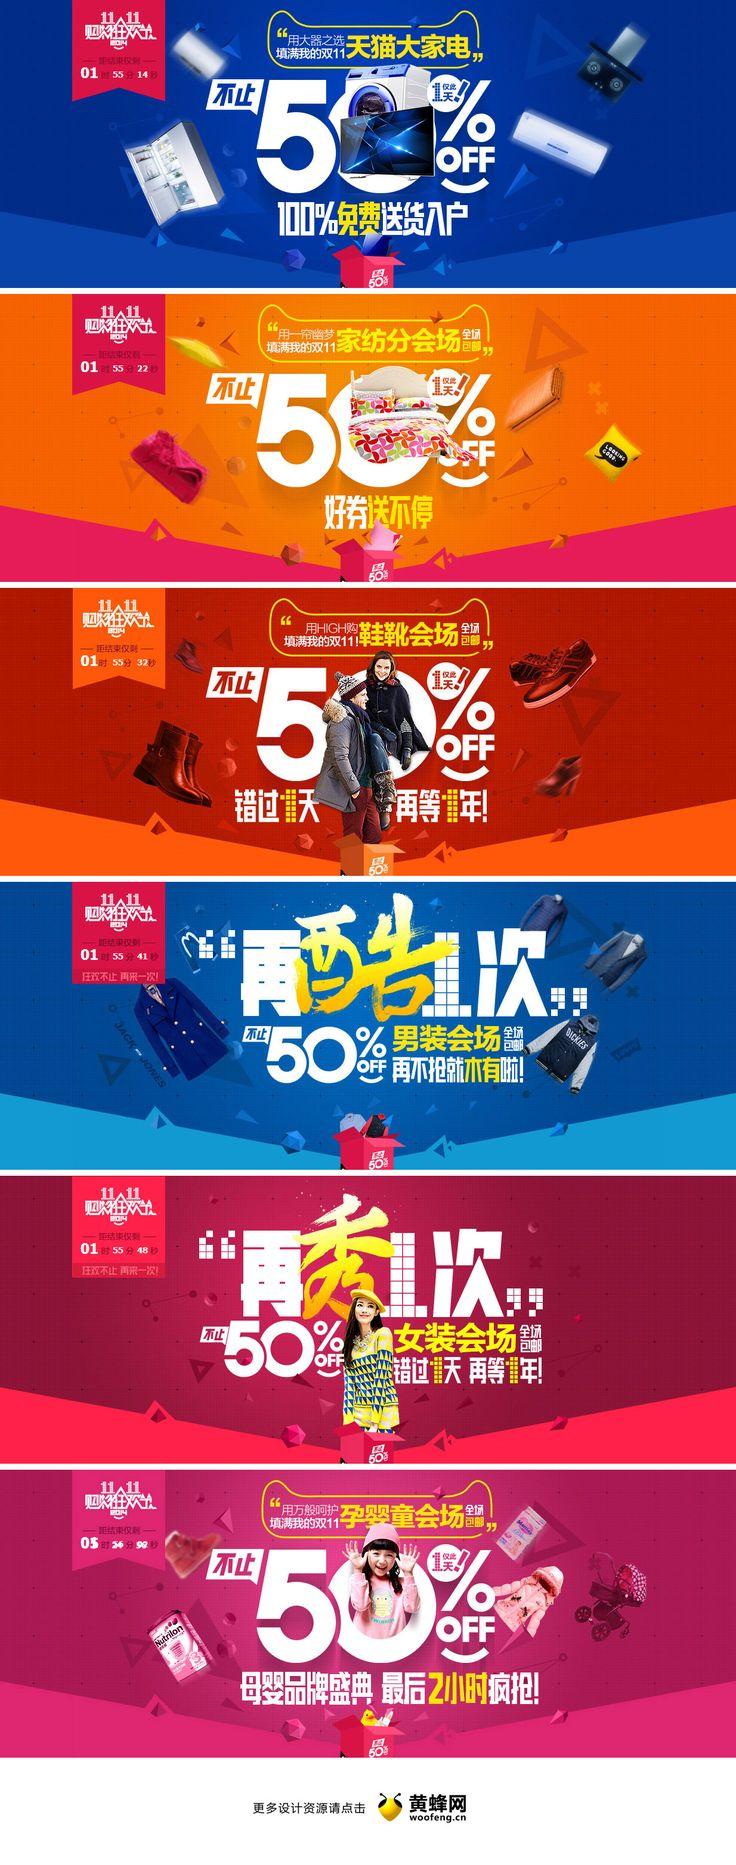 天猫2014双11各会场头图banner设计